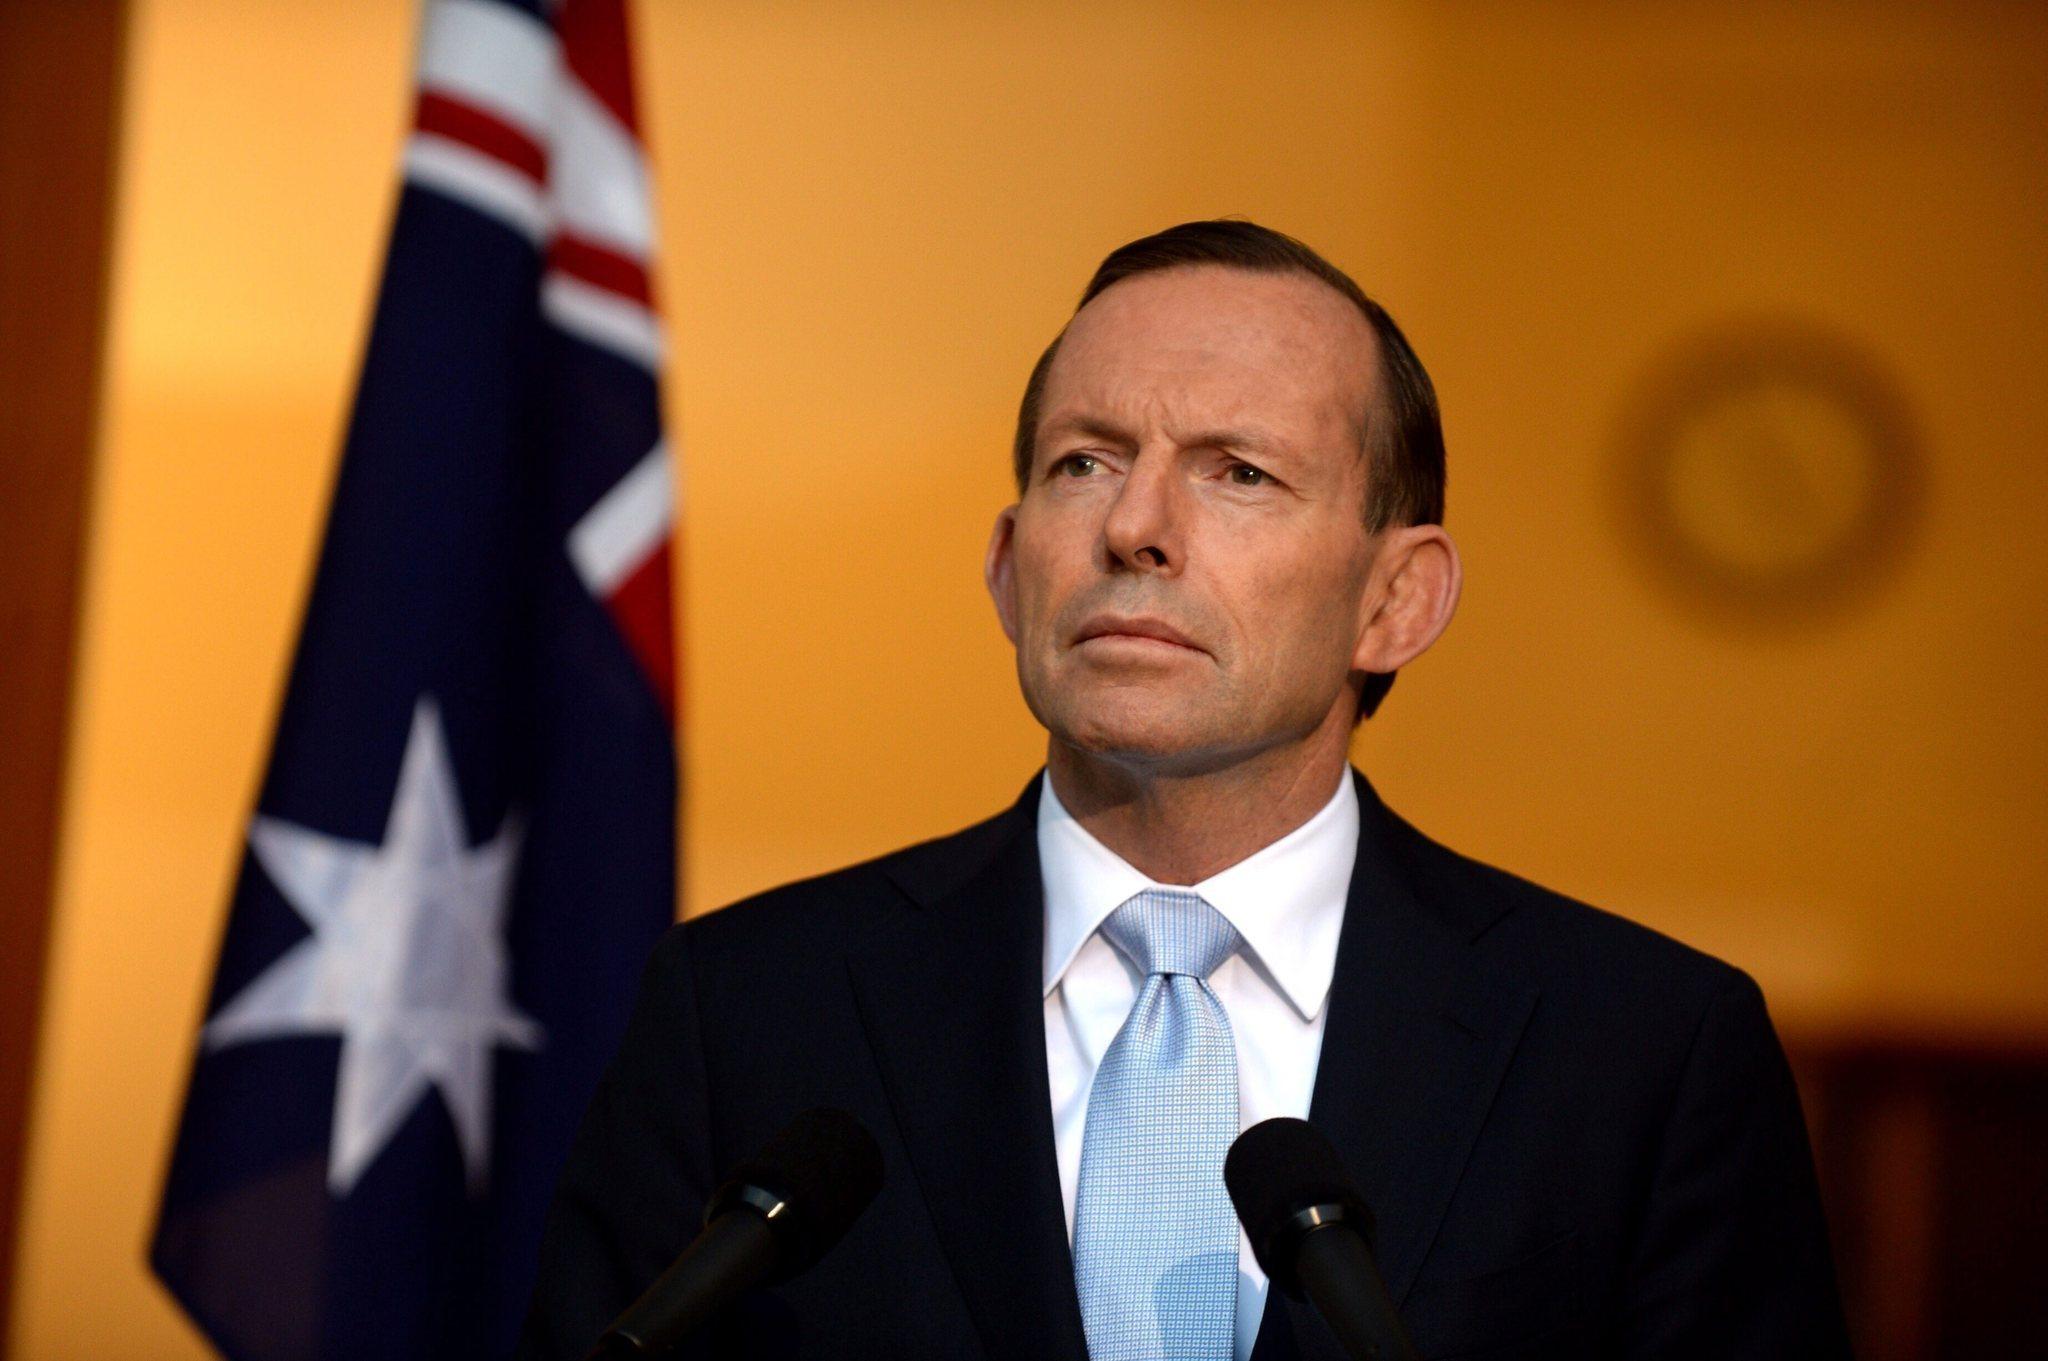 Australian Premier Tony Abbott under fire as 'environmental vandal'